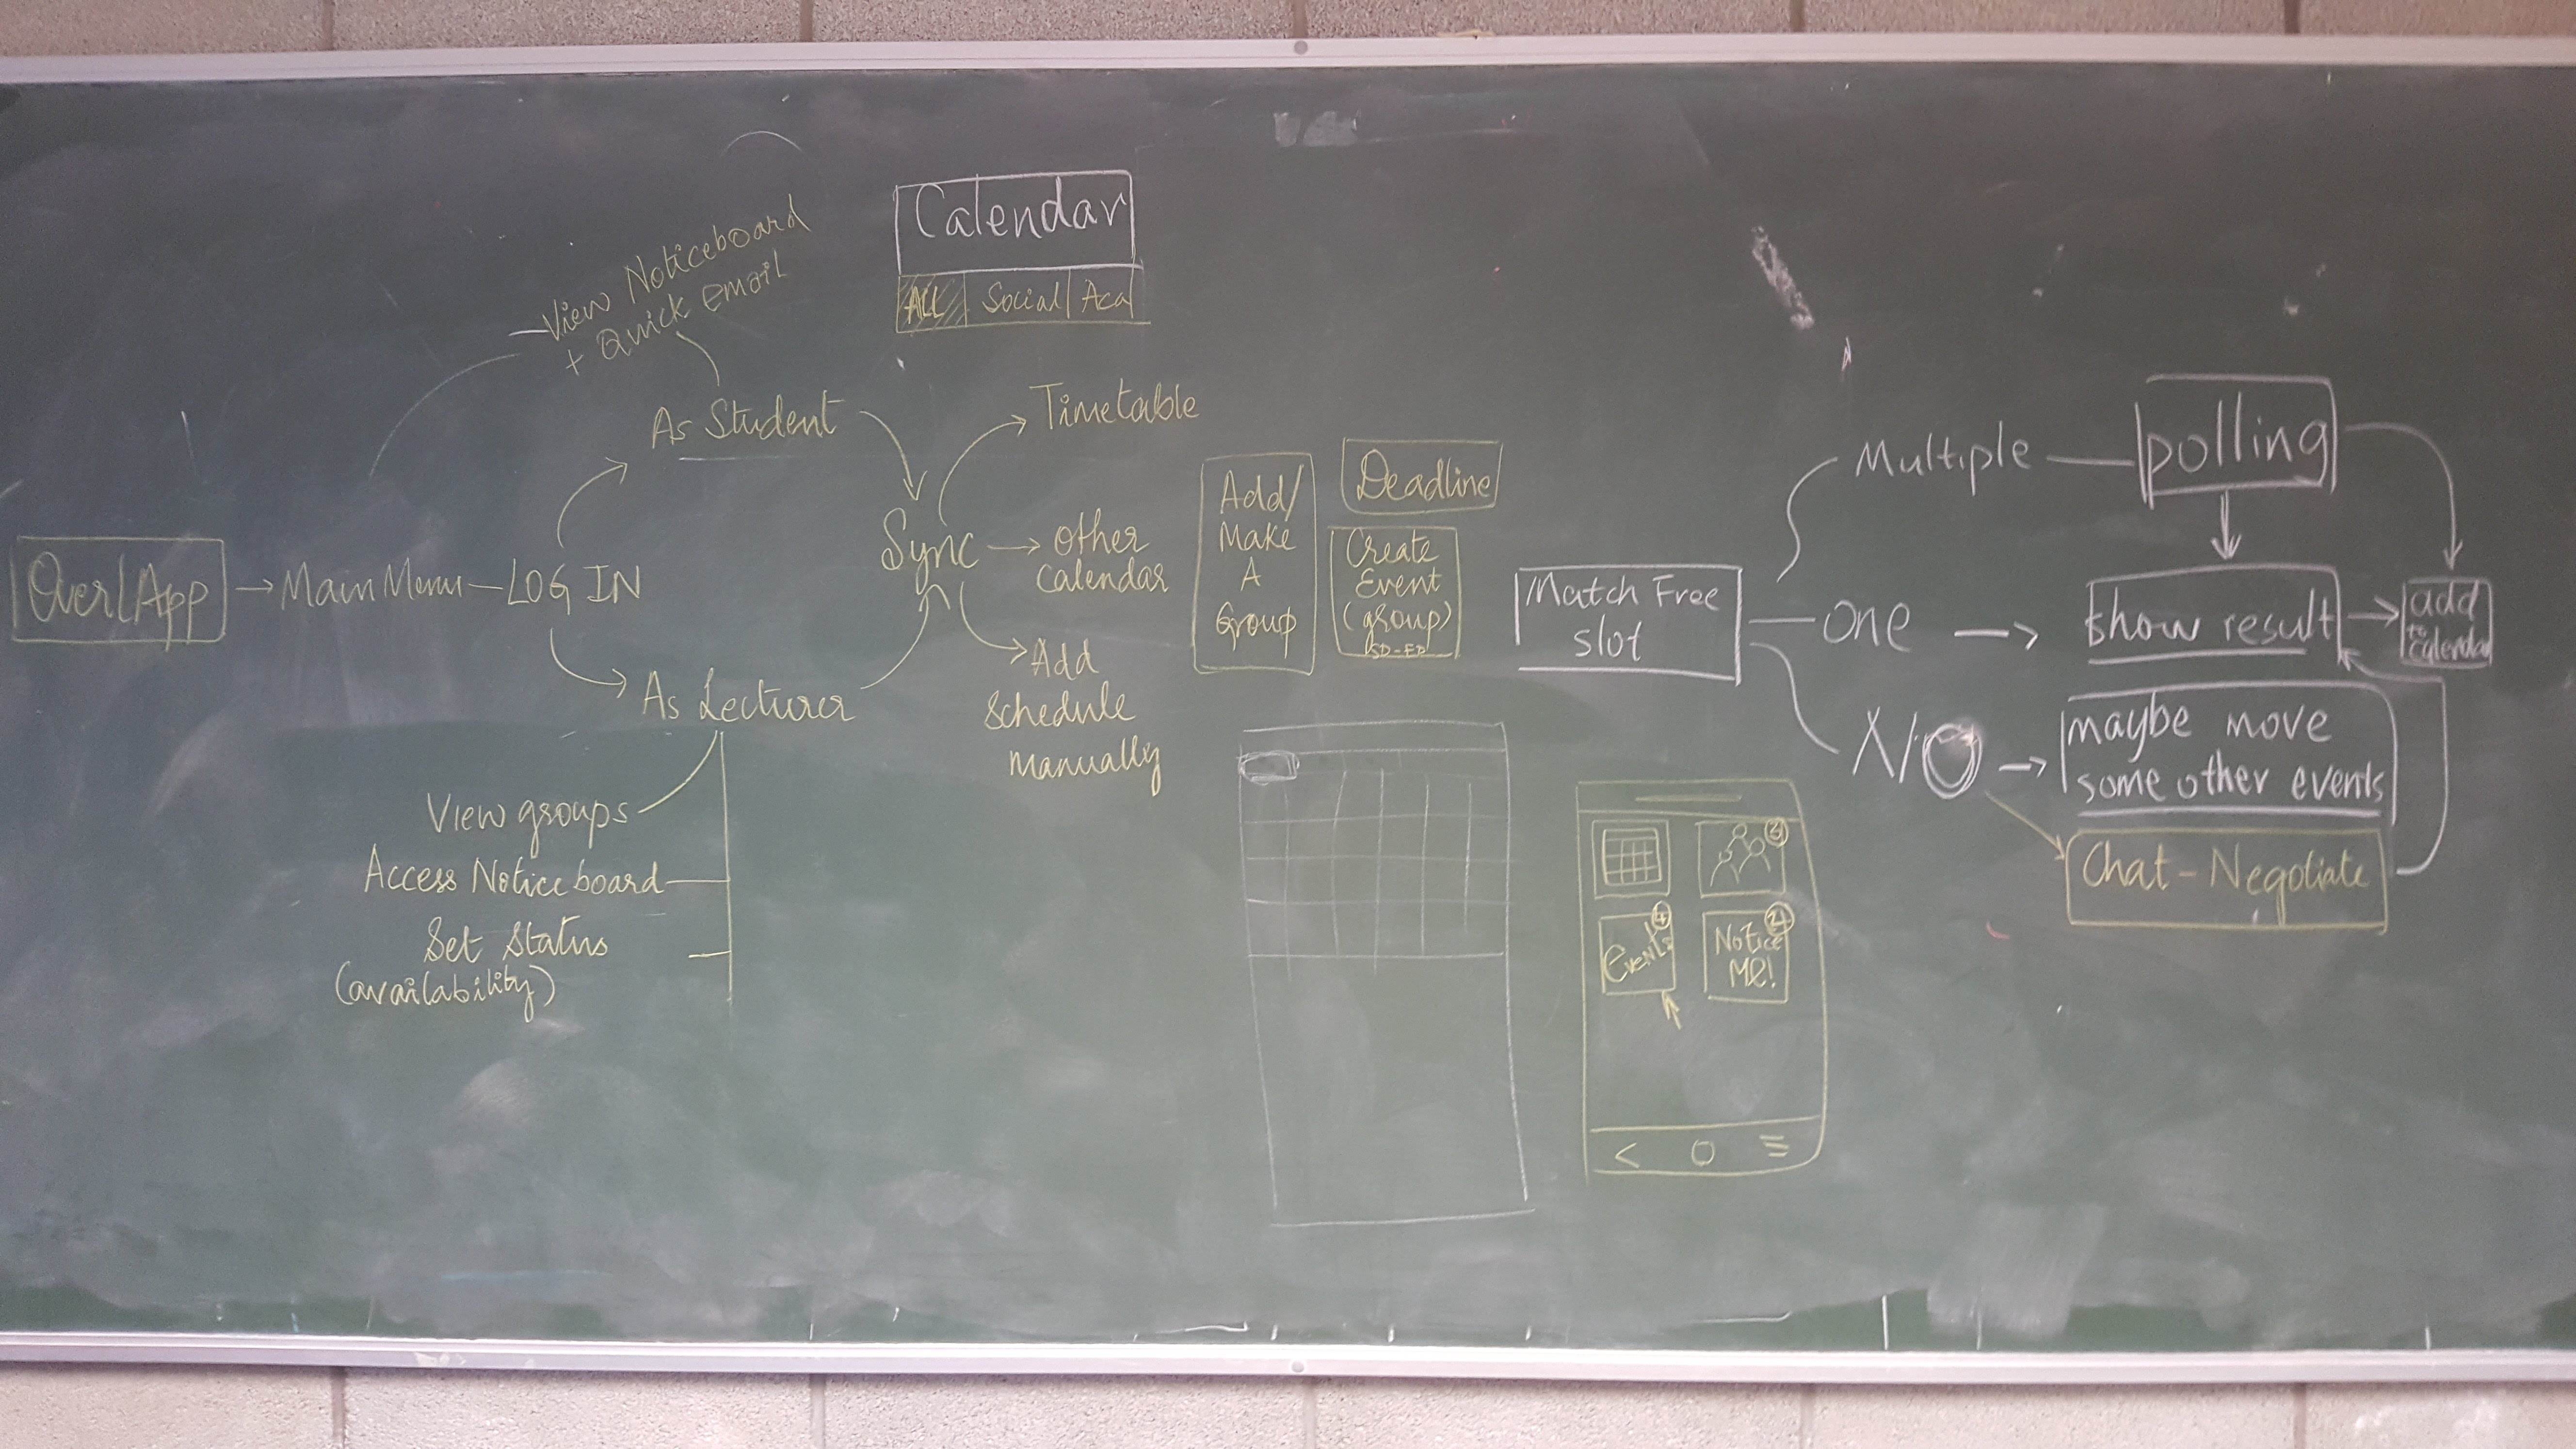 Early flow diagram.